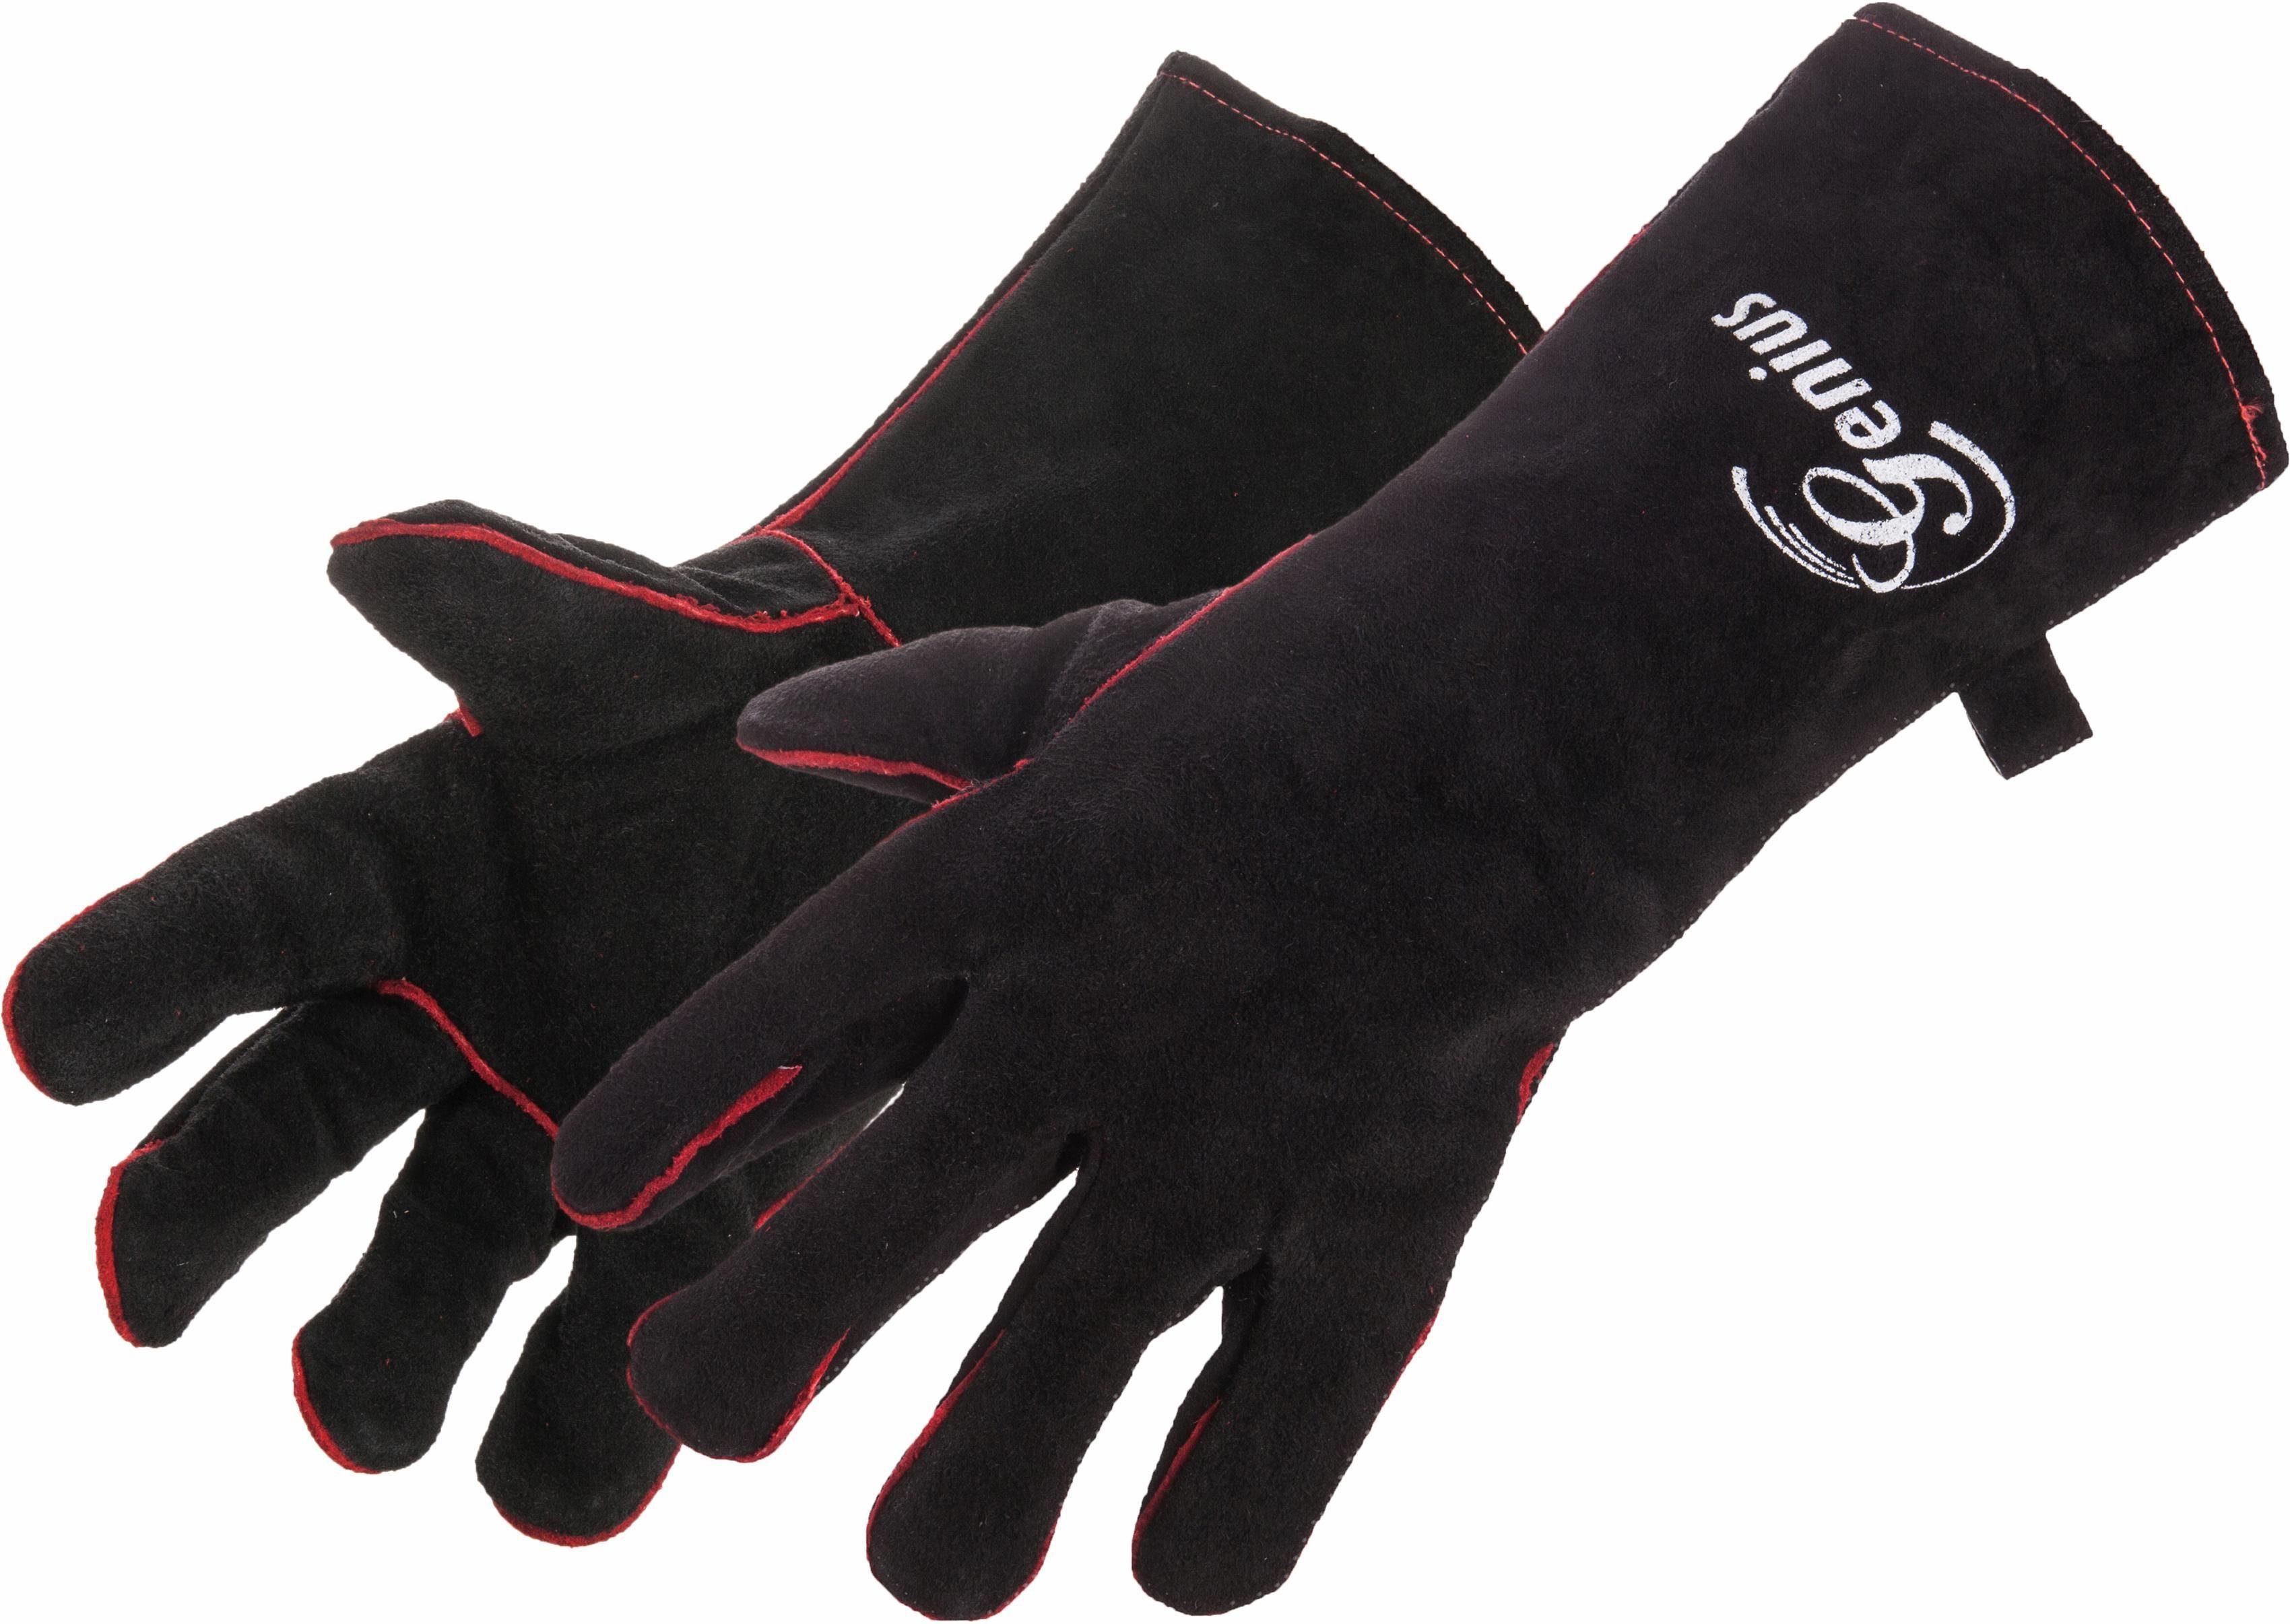 Genius Grill-Handschuhe, BBQ